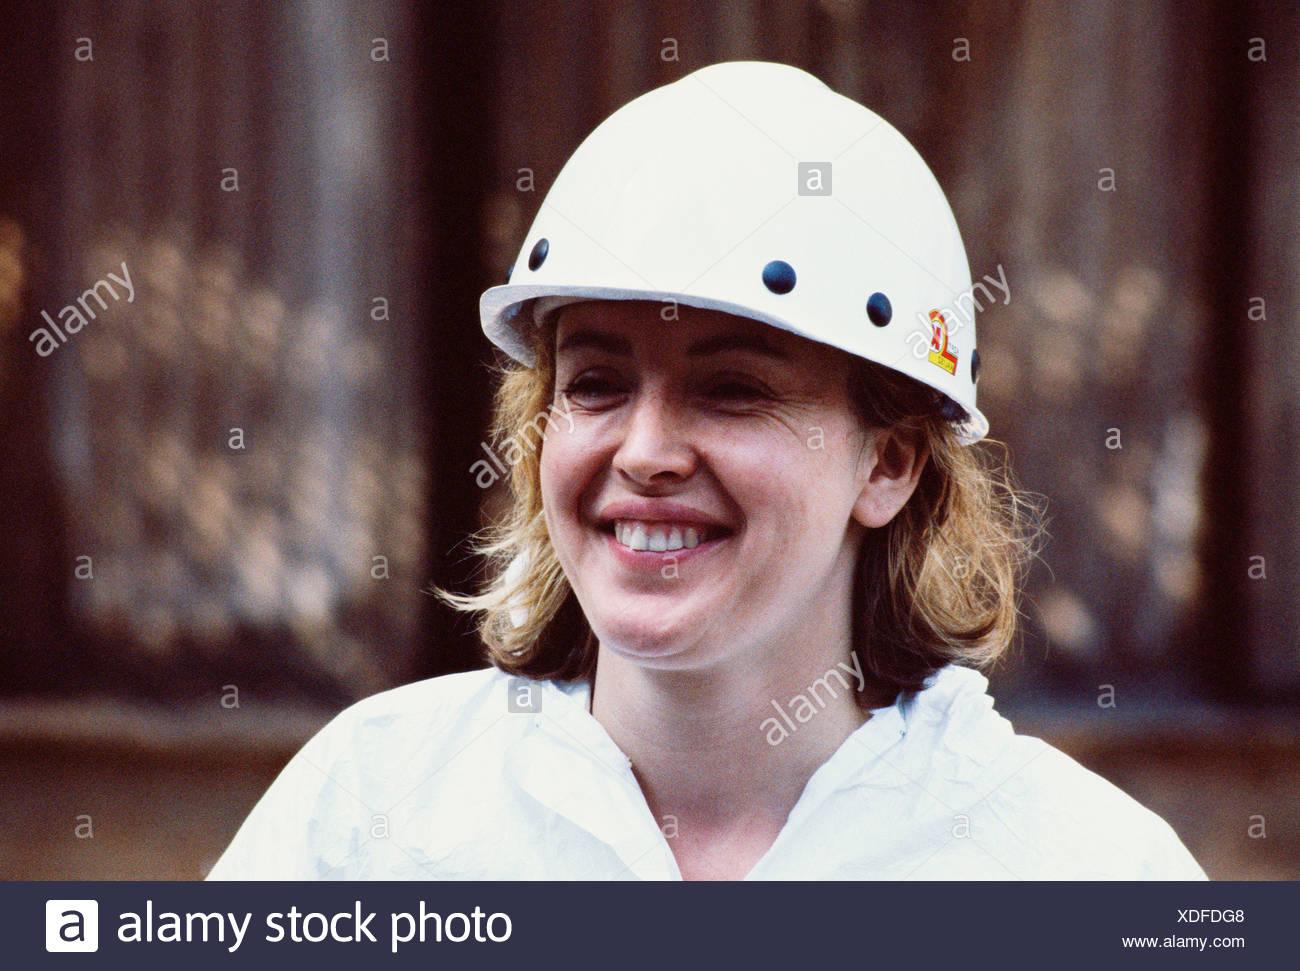 UK Industry. Woman wearing hard hat. - Stock Image